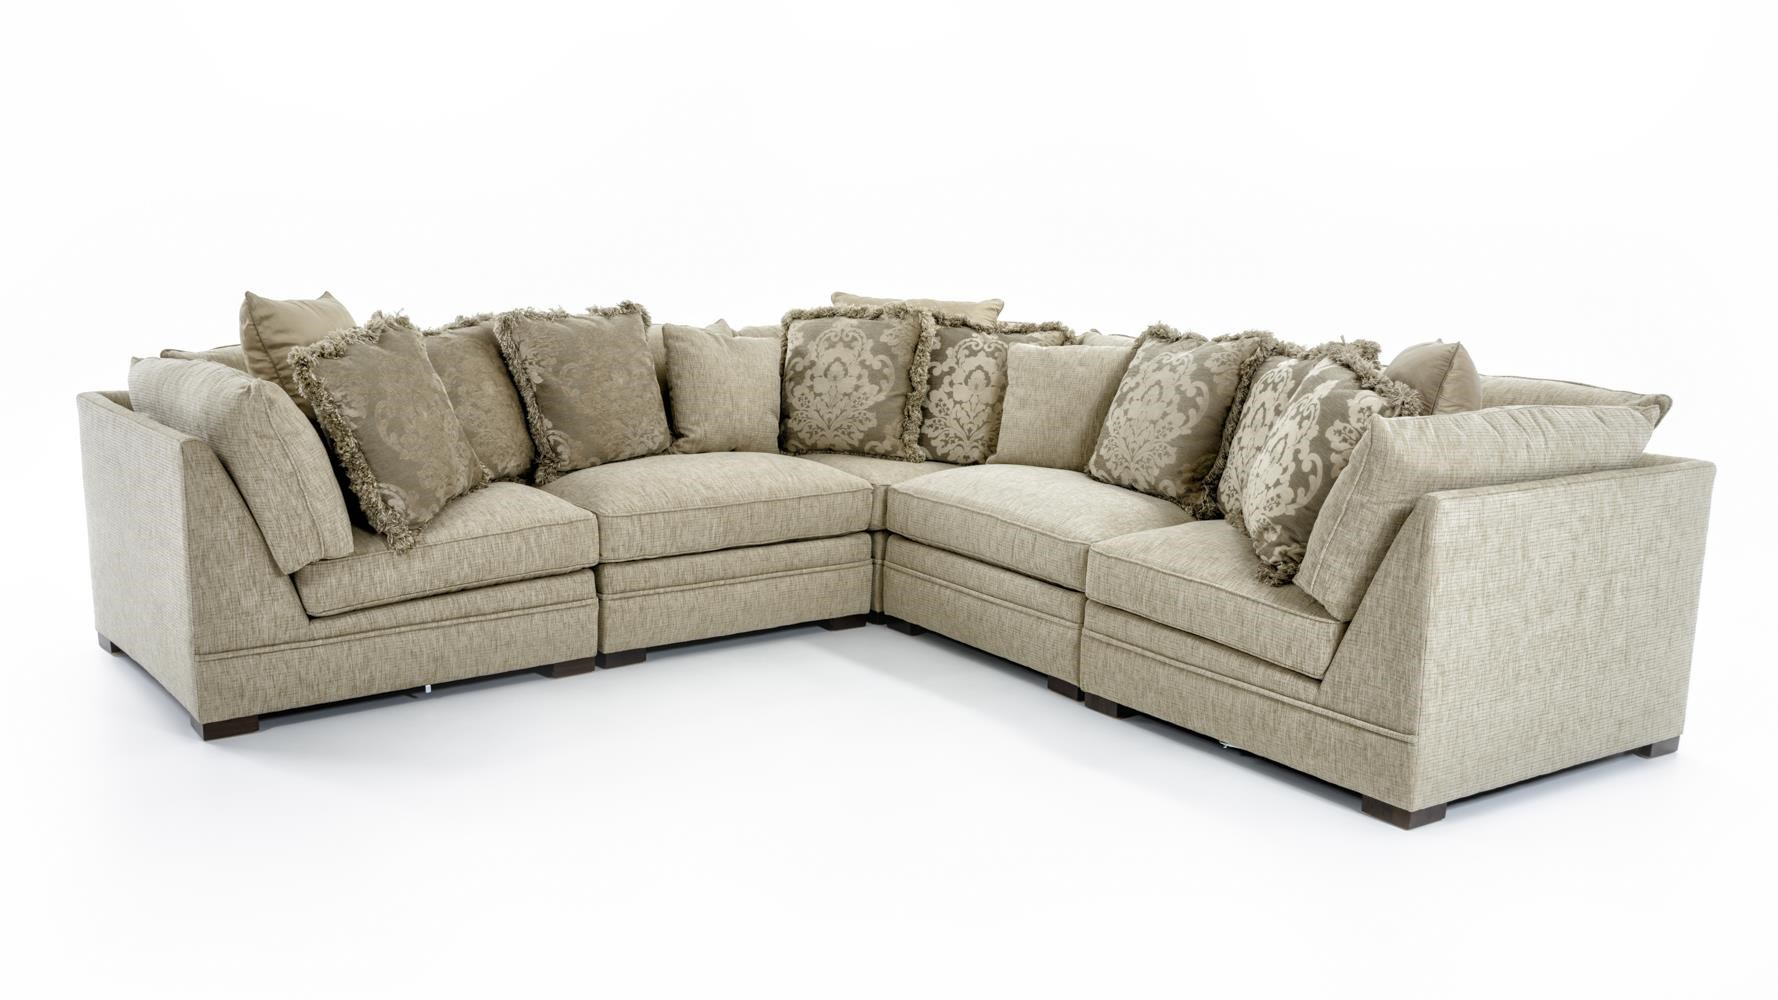 5 Piece Corner Sectional Sofa